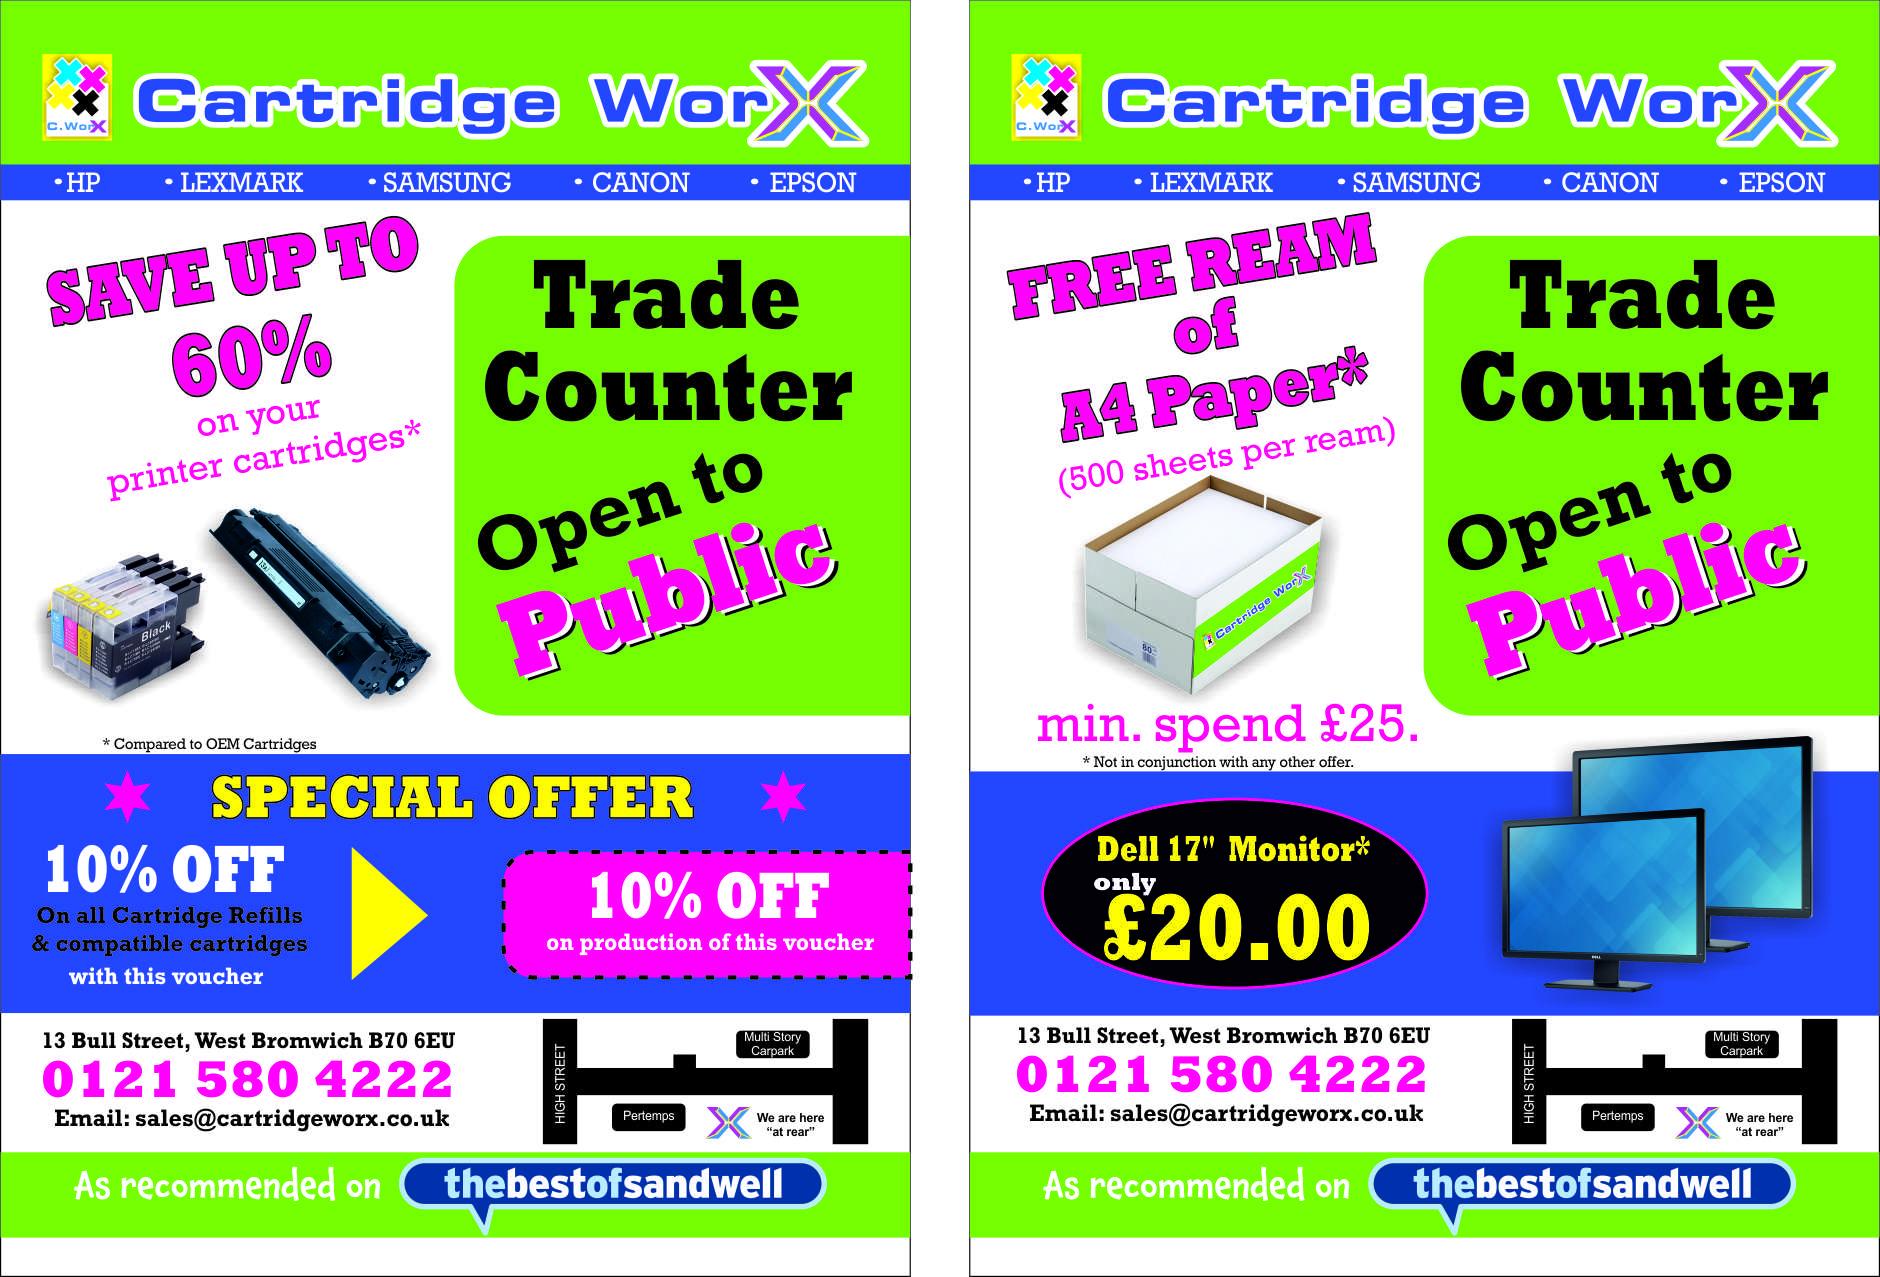 Get 10% off in Cartridge Worx, West Bromwich